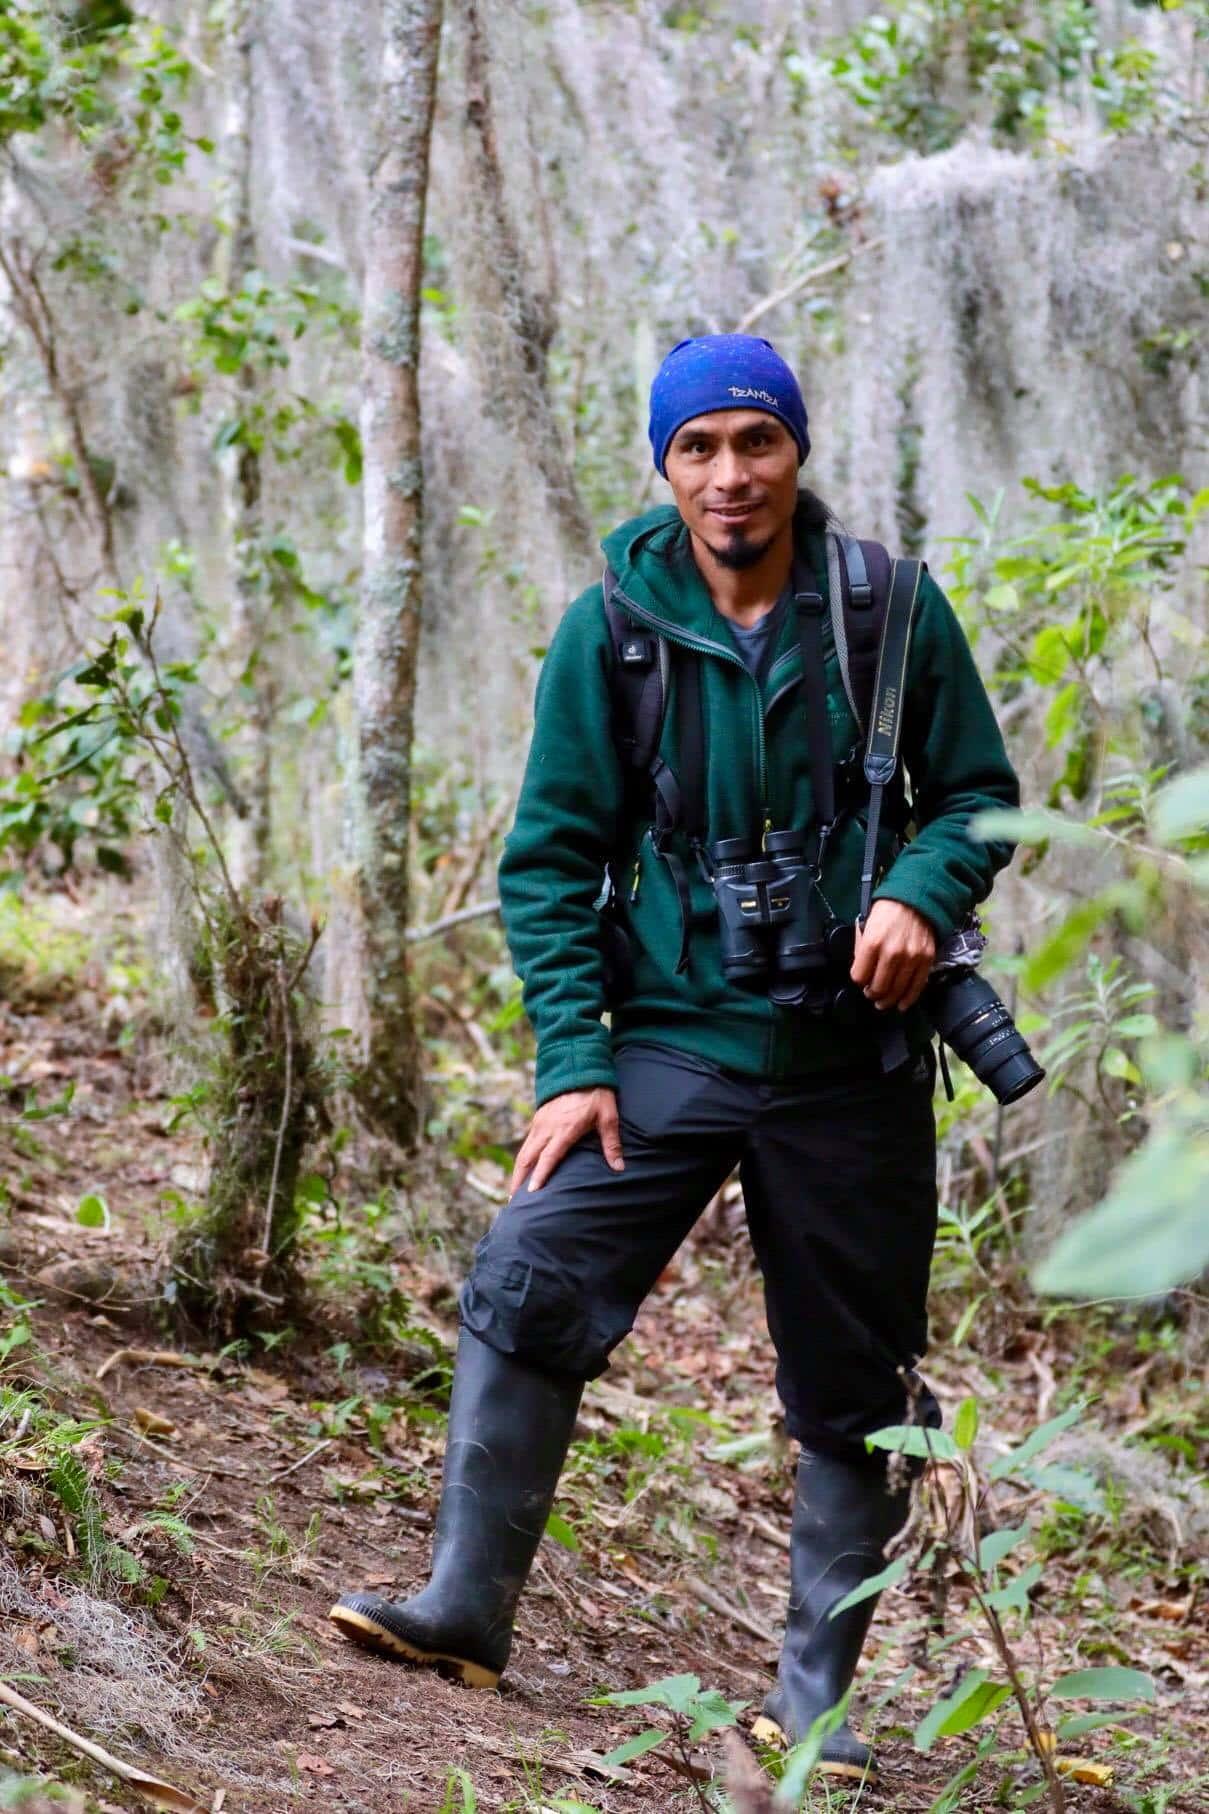 Carlos Diaz, Birdwatching Guide in Baños, Patate, and Tunguraghua